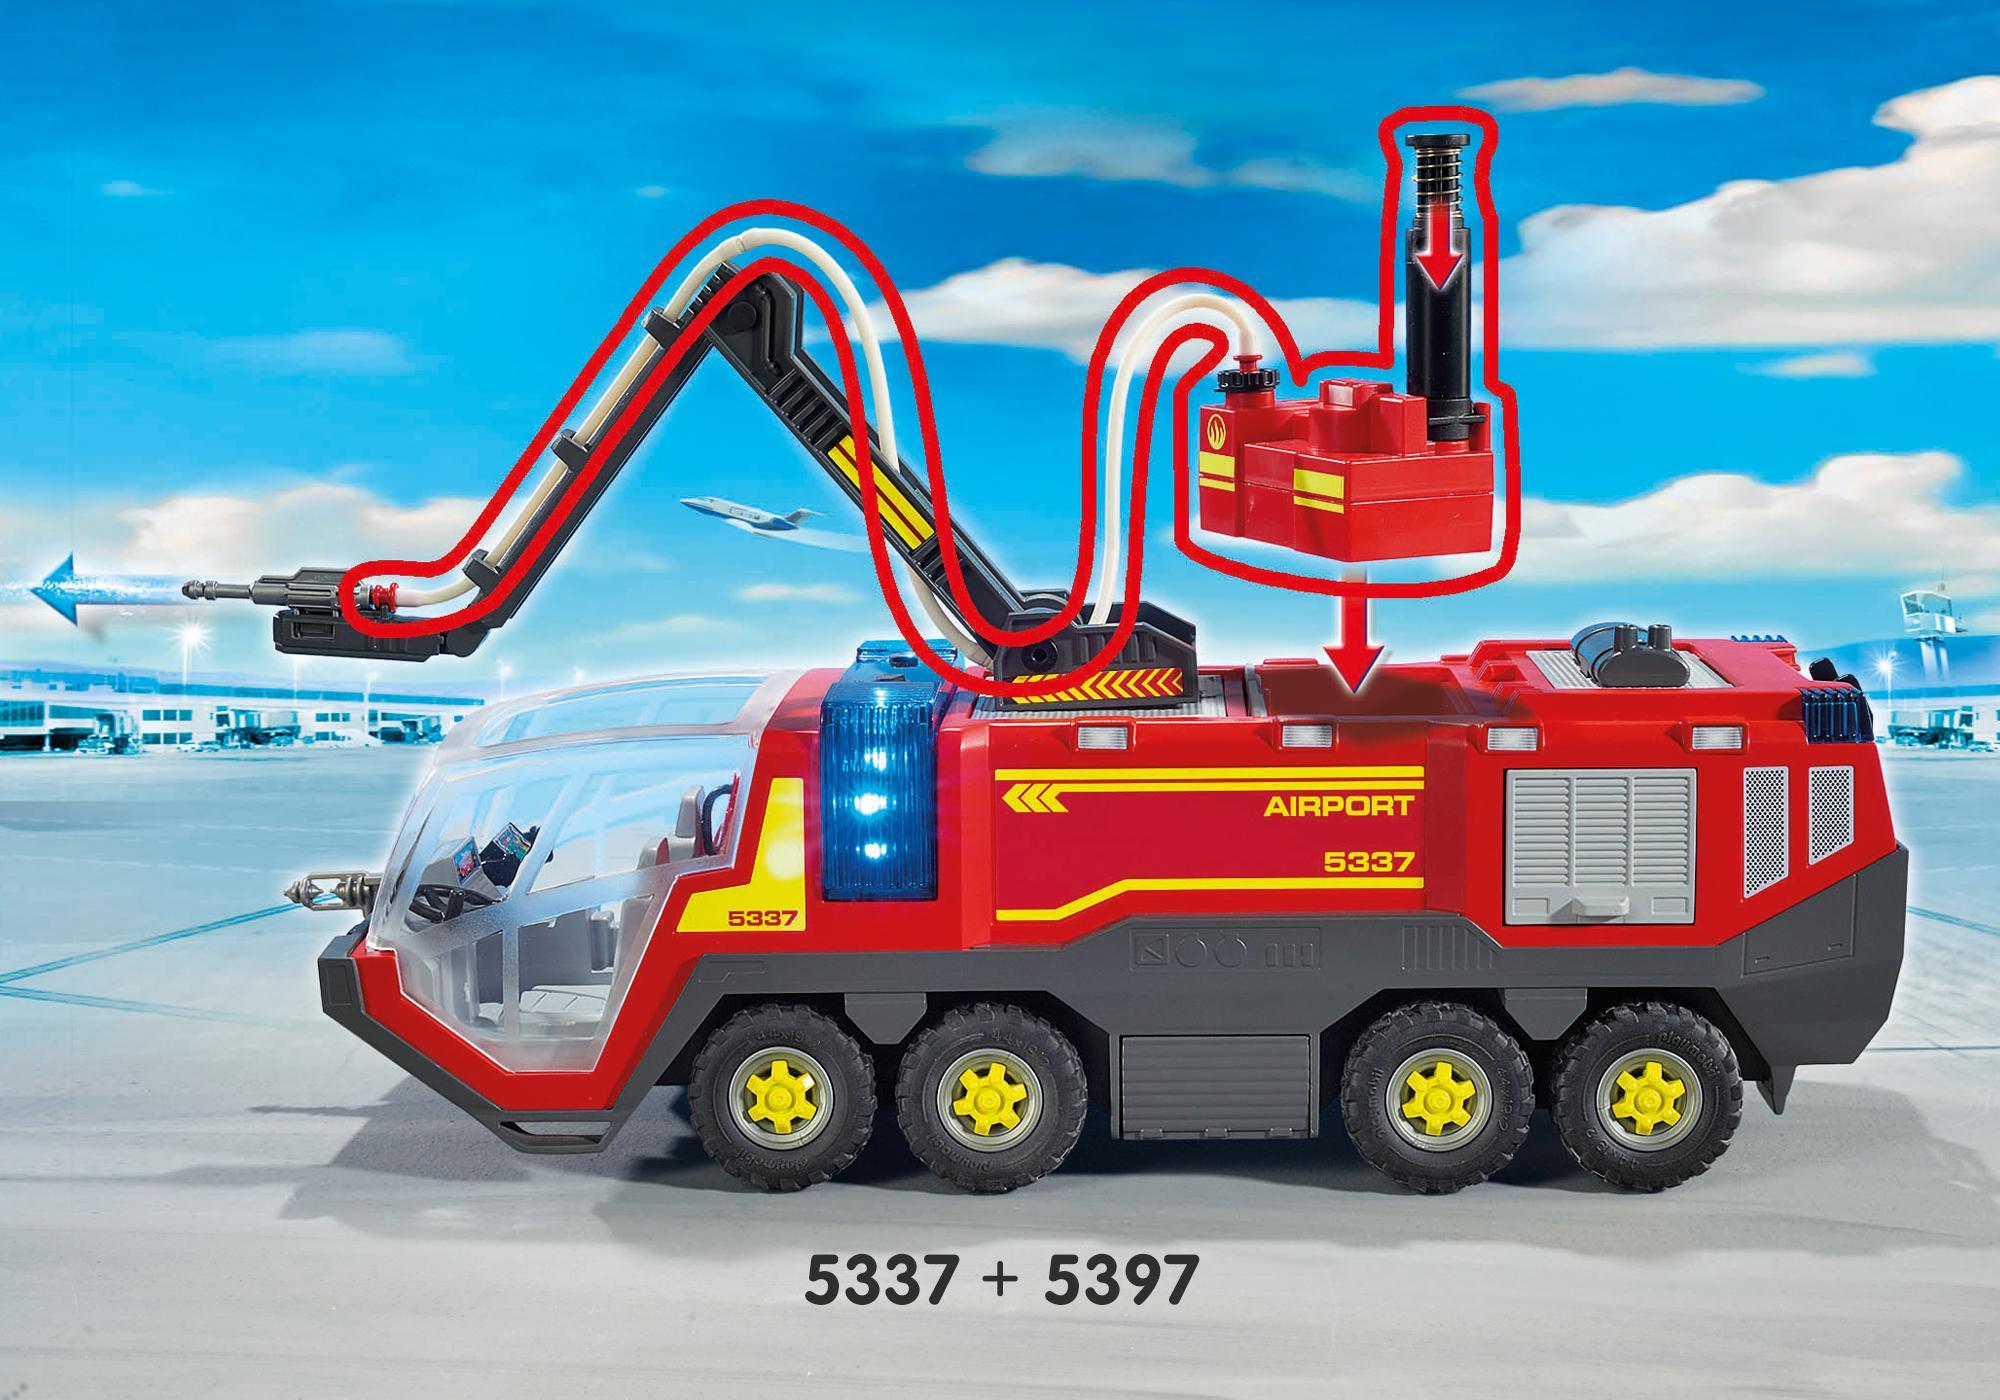 http://media.playmobil.com/i/playmobil/5337_product_extra5/Πυροσβεστικό όχημα αεροδρομίου με φώτα και ήχο